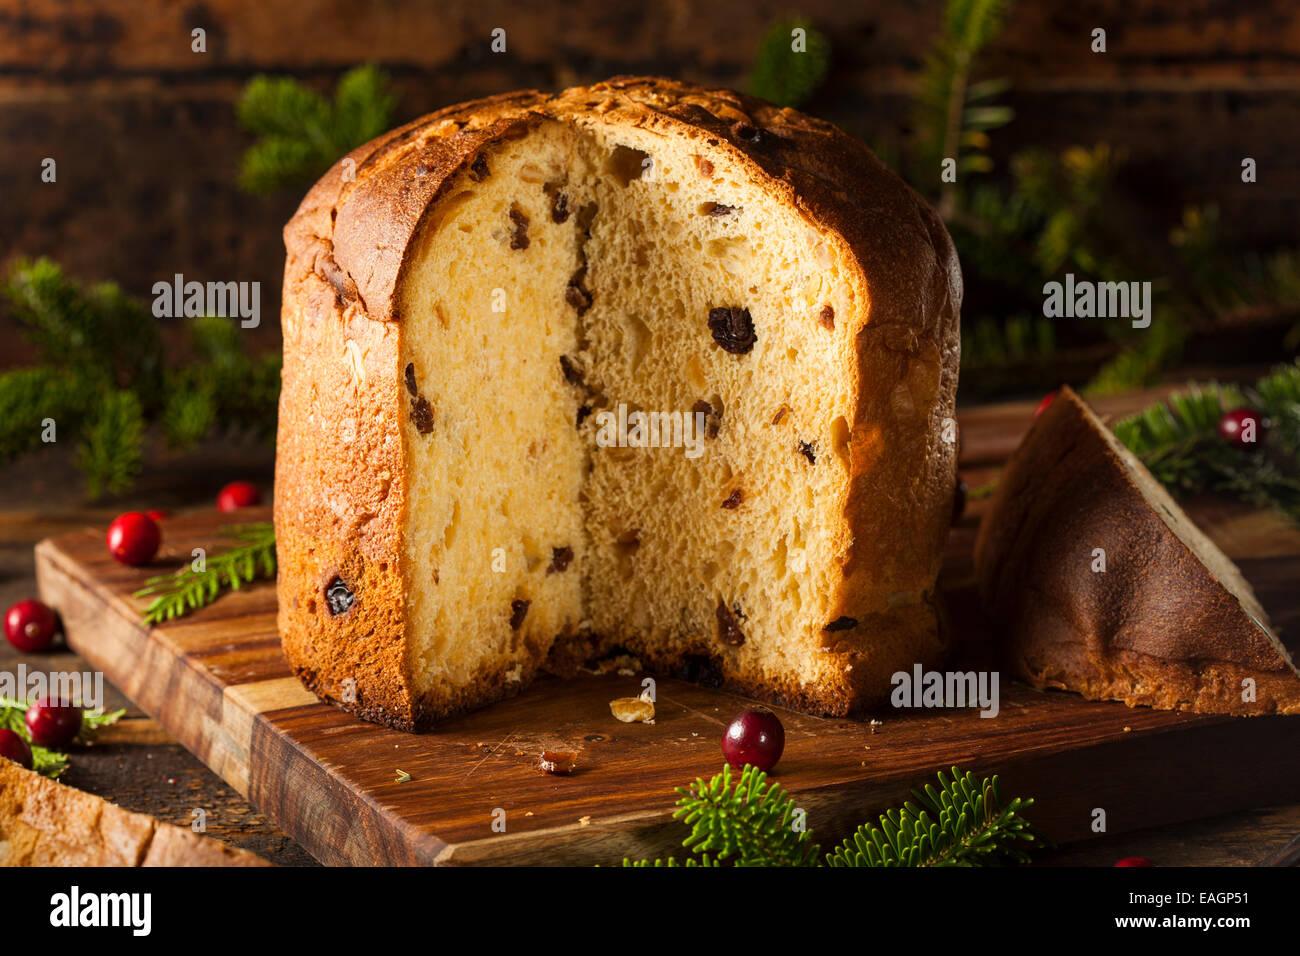 Homemade Panettone Fruit Cake Ready for Christmas - Stock Image